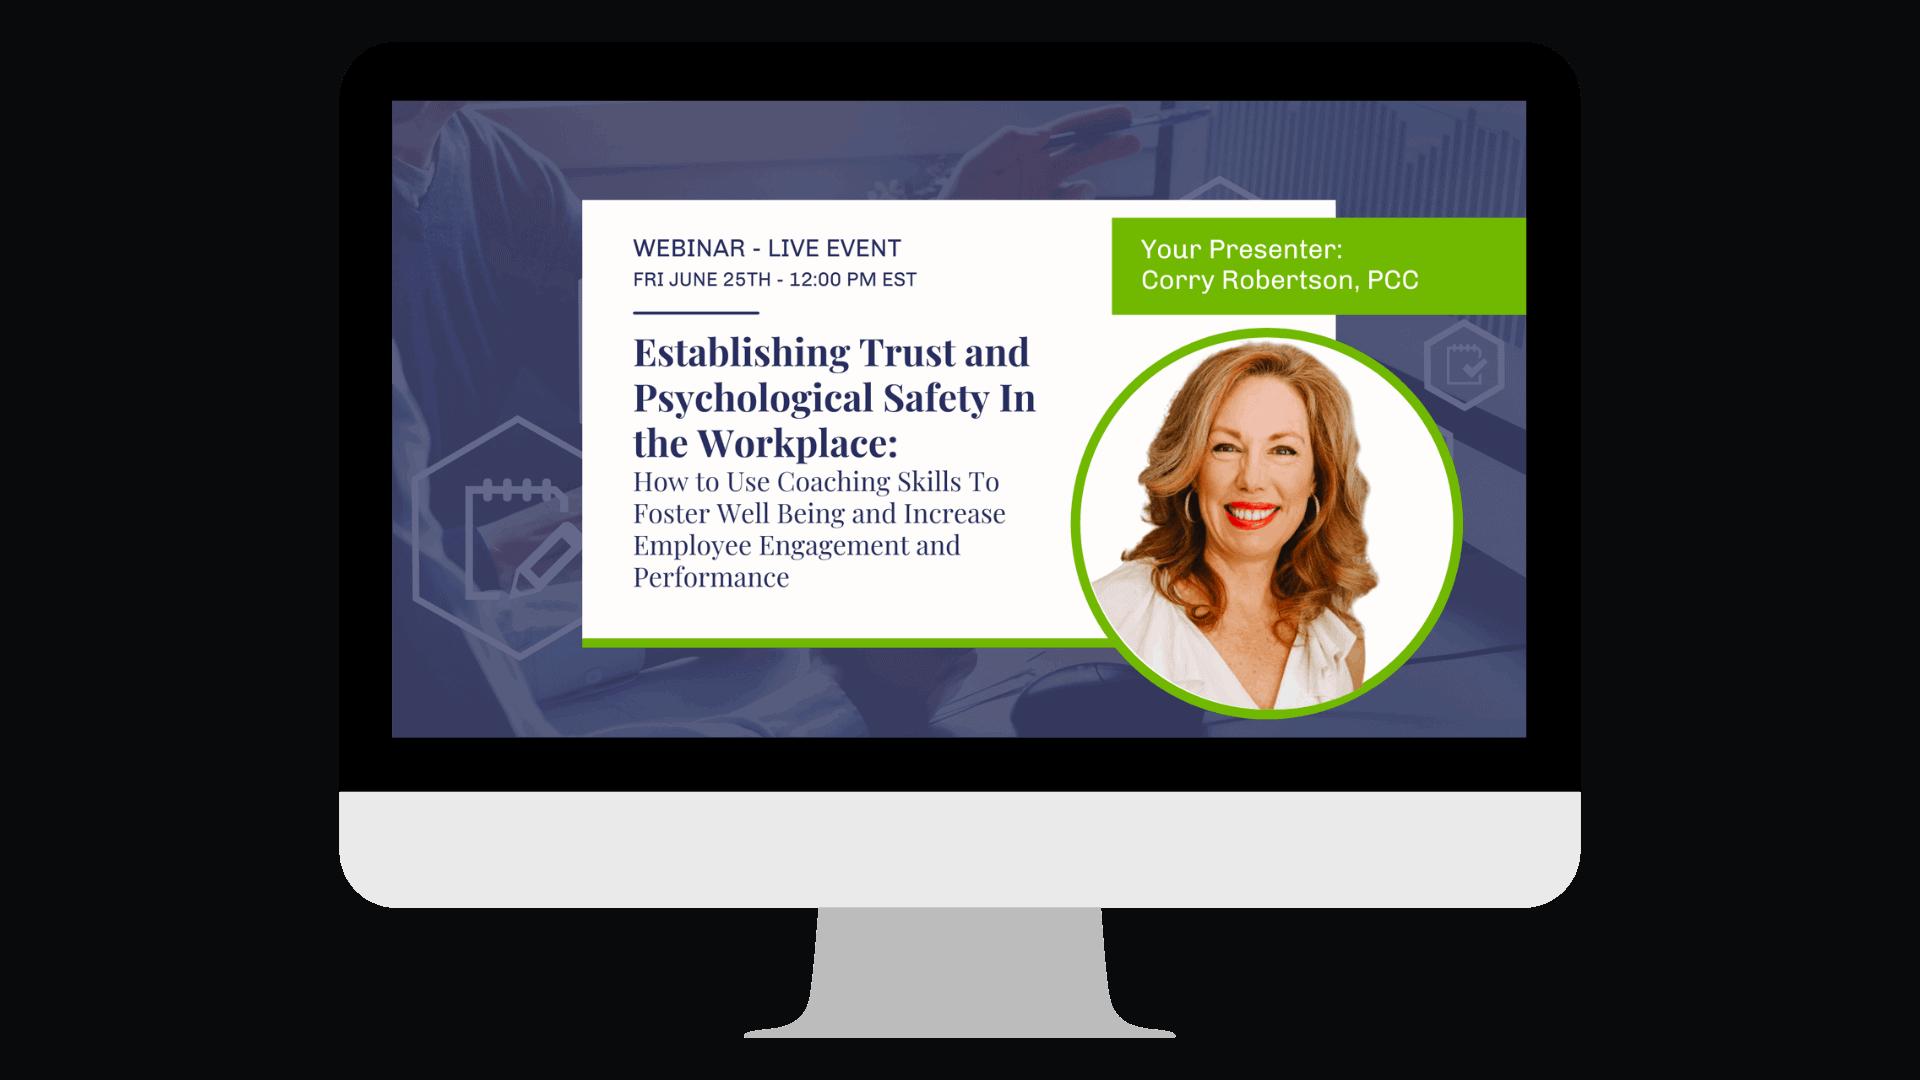 Webinar | Live Online EventJune 25th, 2021 Establishing Trust and Psychological Safety in the Workplace